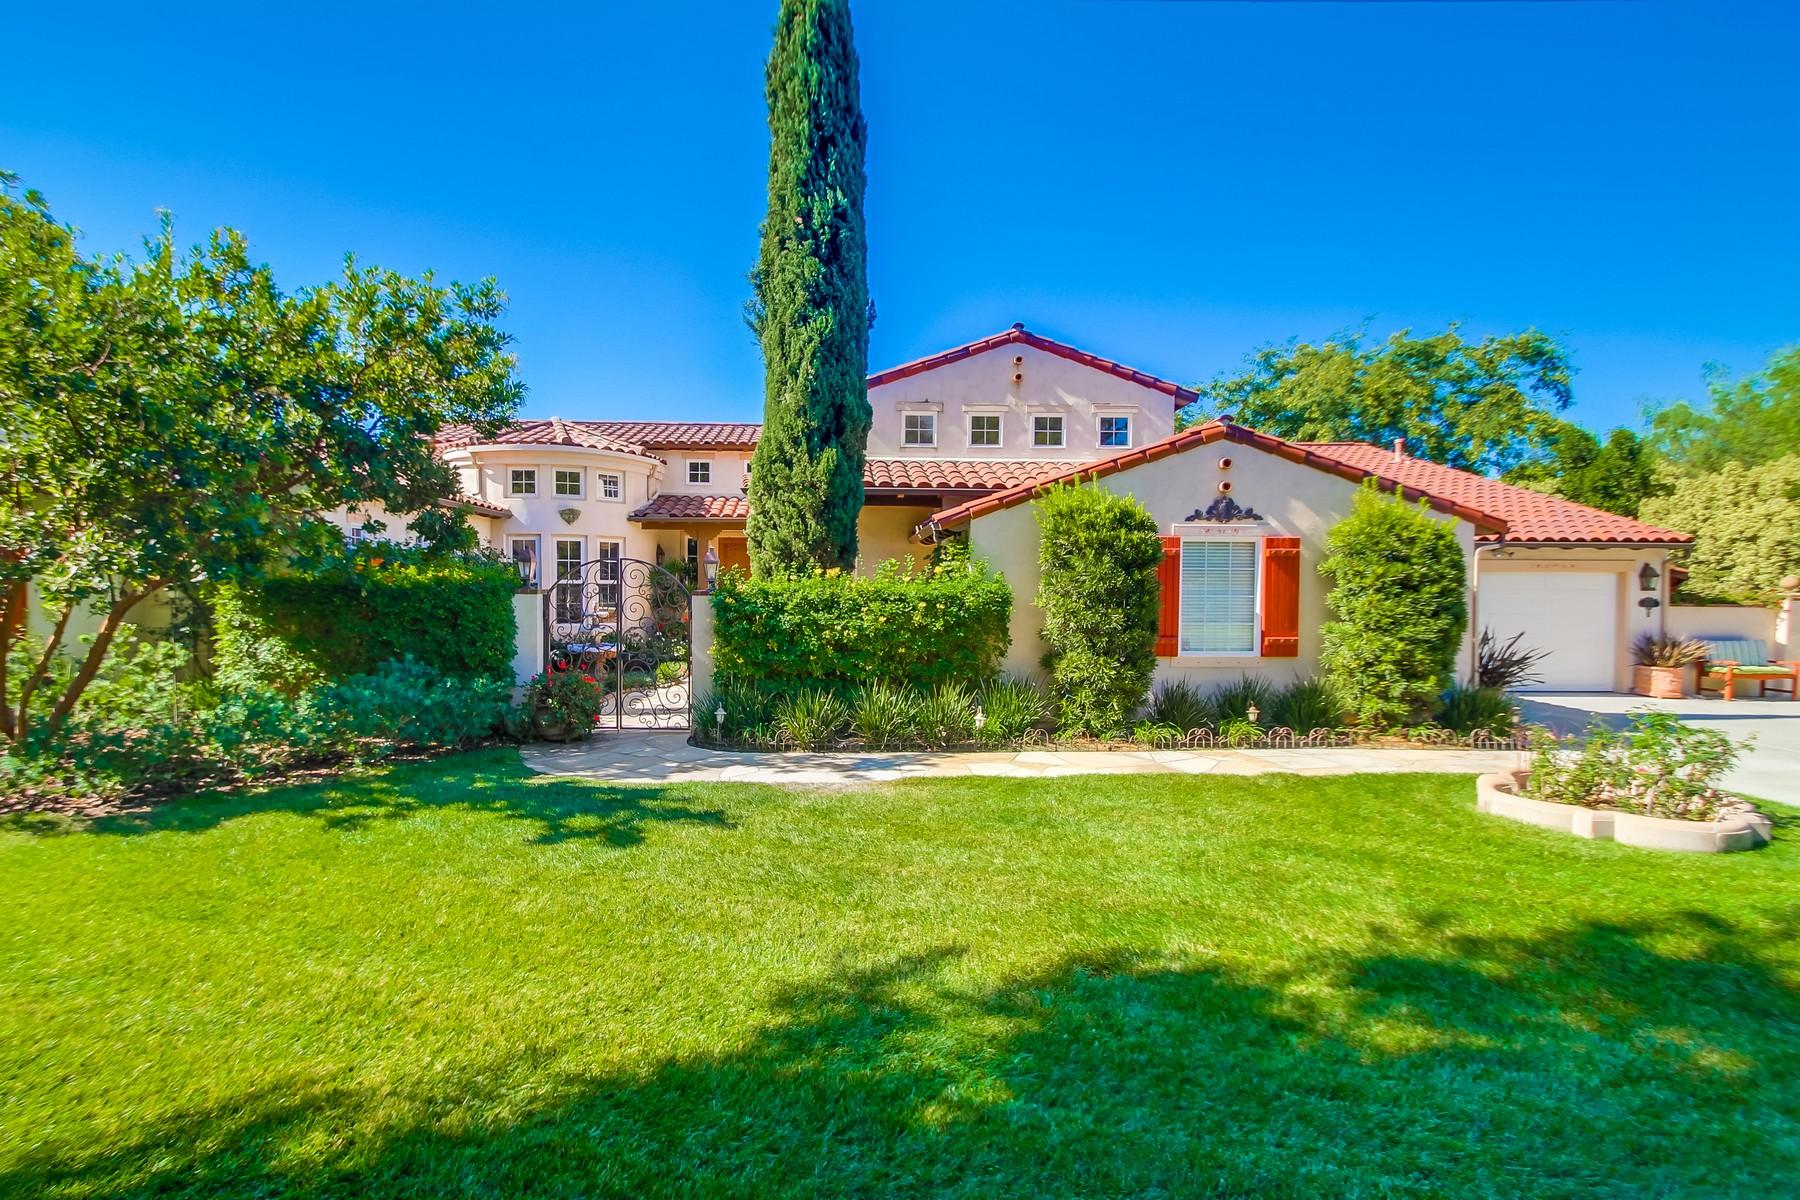 House for Sale at 2007 Kristi Ct 2007 Kristi Ct Fallbrook, California 92028 United States